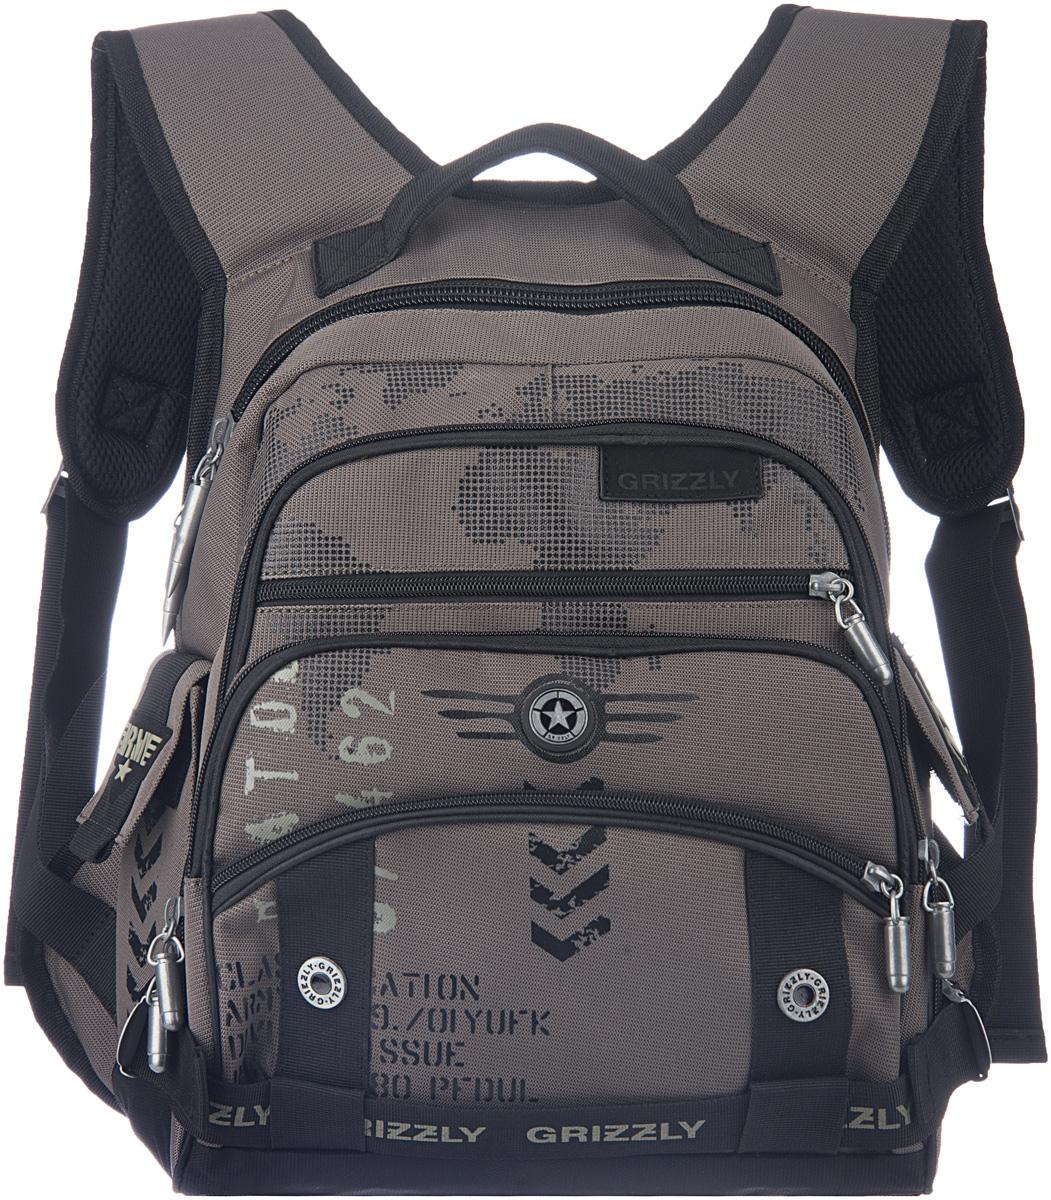 Рюкзак молодежный мужской Grizzly, цвет: черный, серый, 18,5 л. RU-501-2/2 рюкзаки grizzly рюкзак